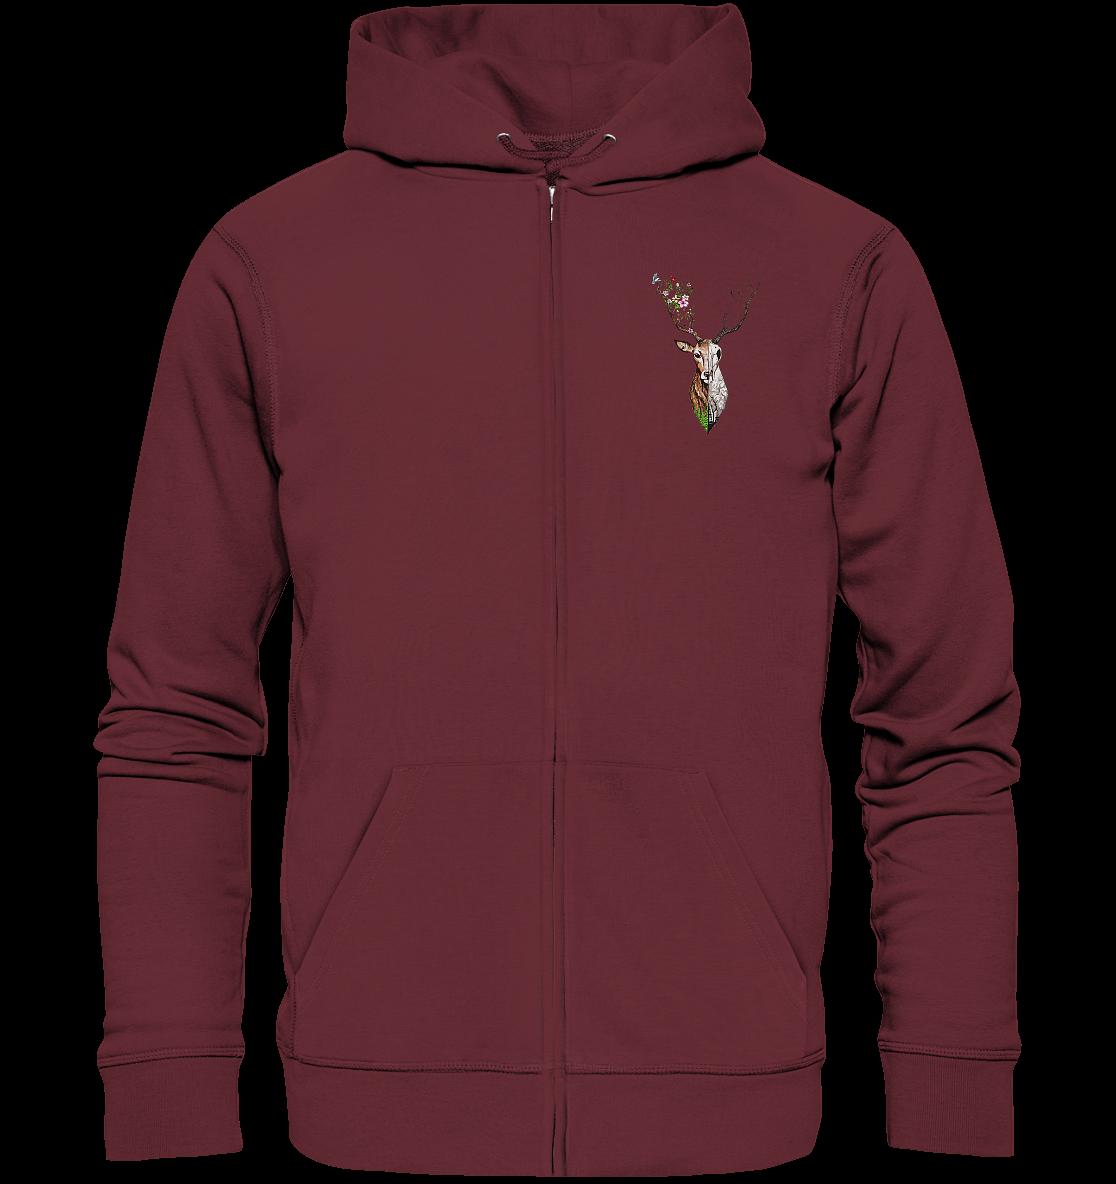 front-organic-zipper-672b34-1116x-1.png